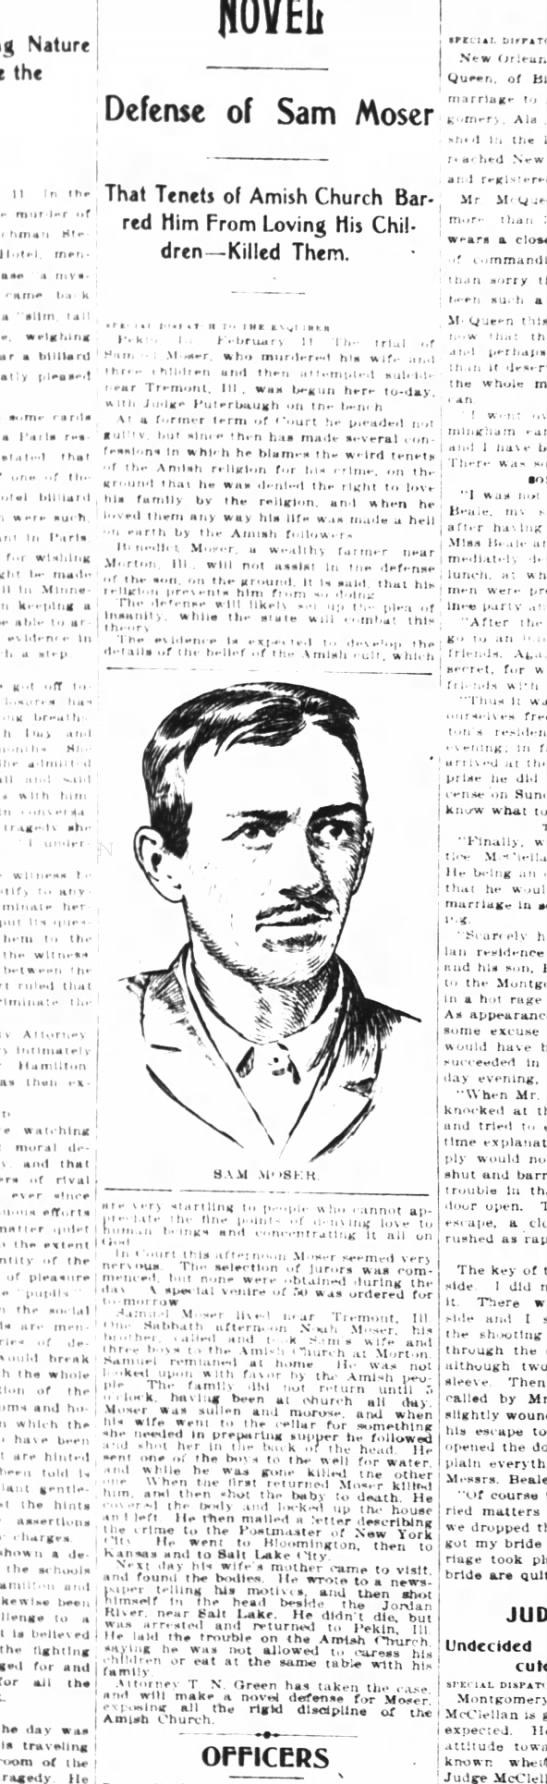 Cincinnati Enquirer 2.12.1901 PEN DRAWING OF SAM